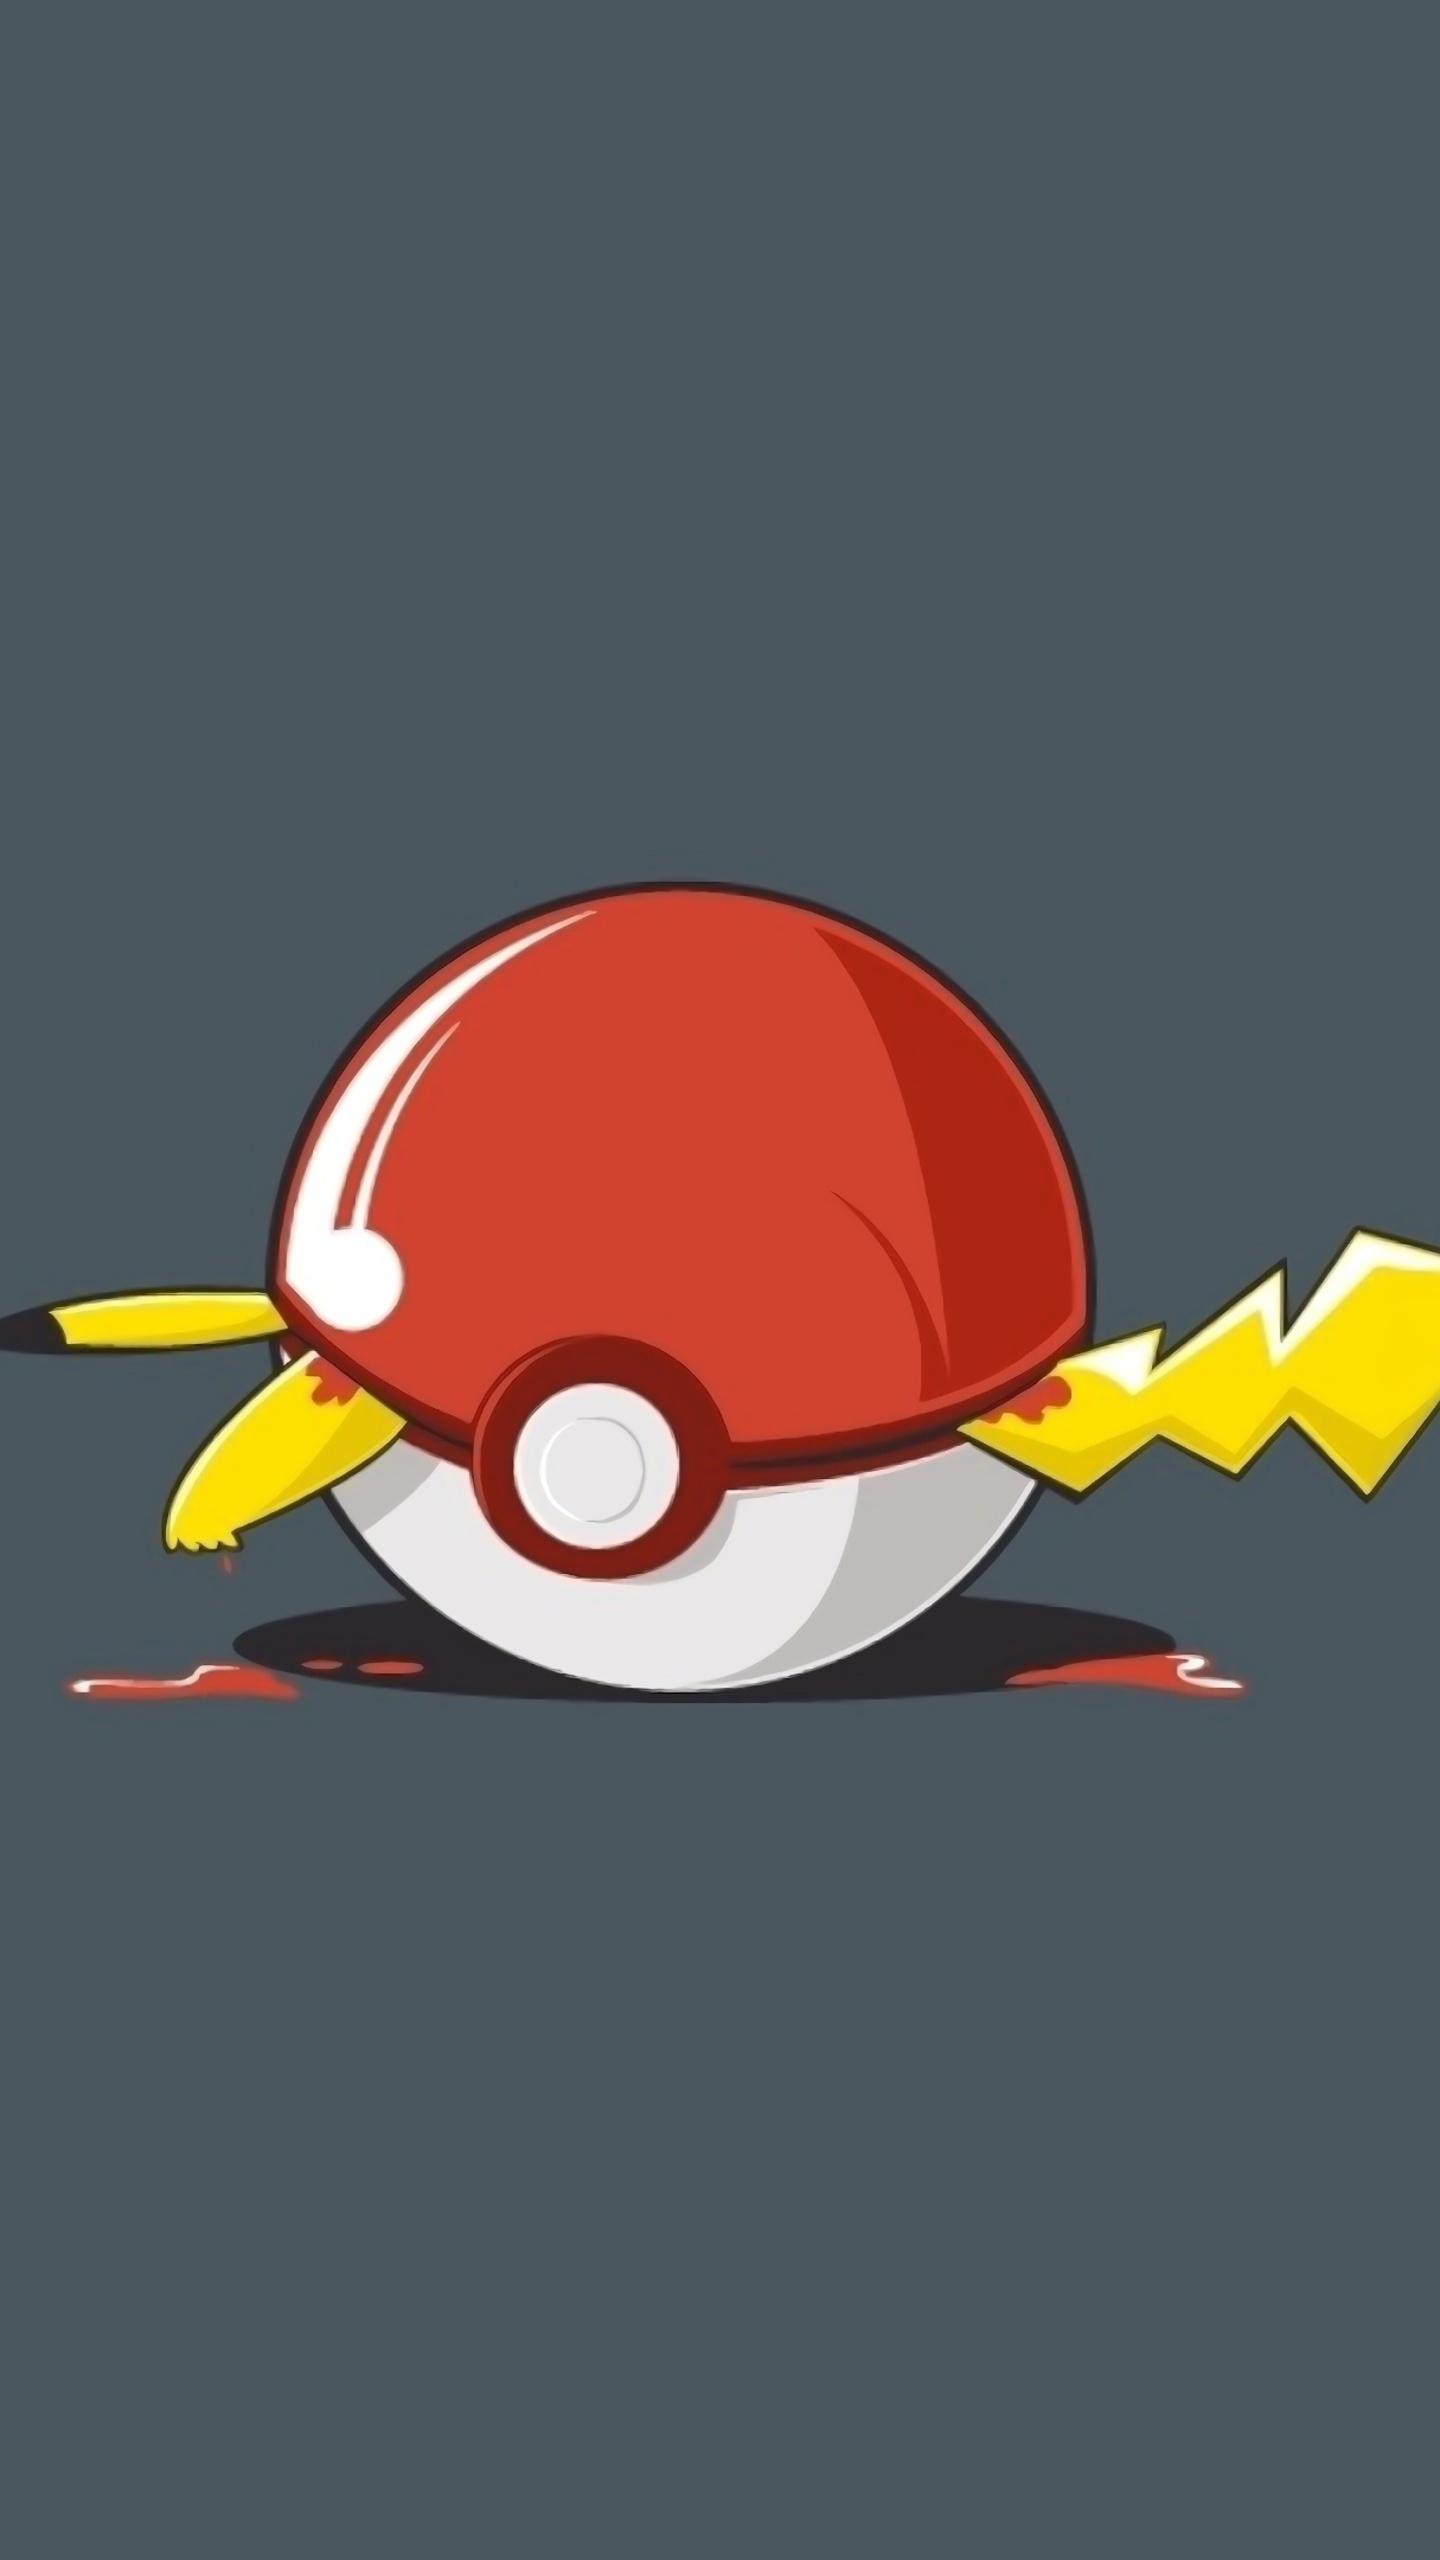 pikachu-pokeball-xc.jpg